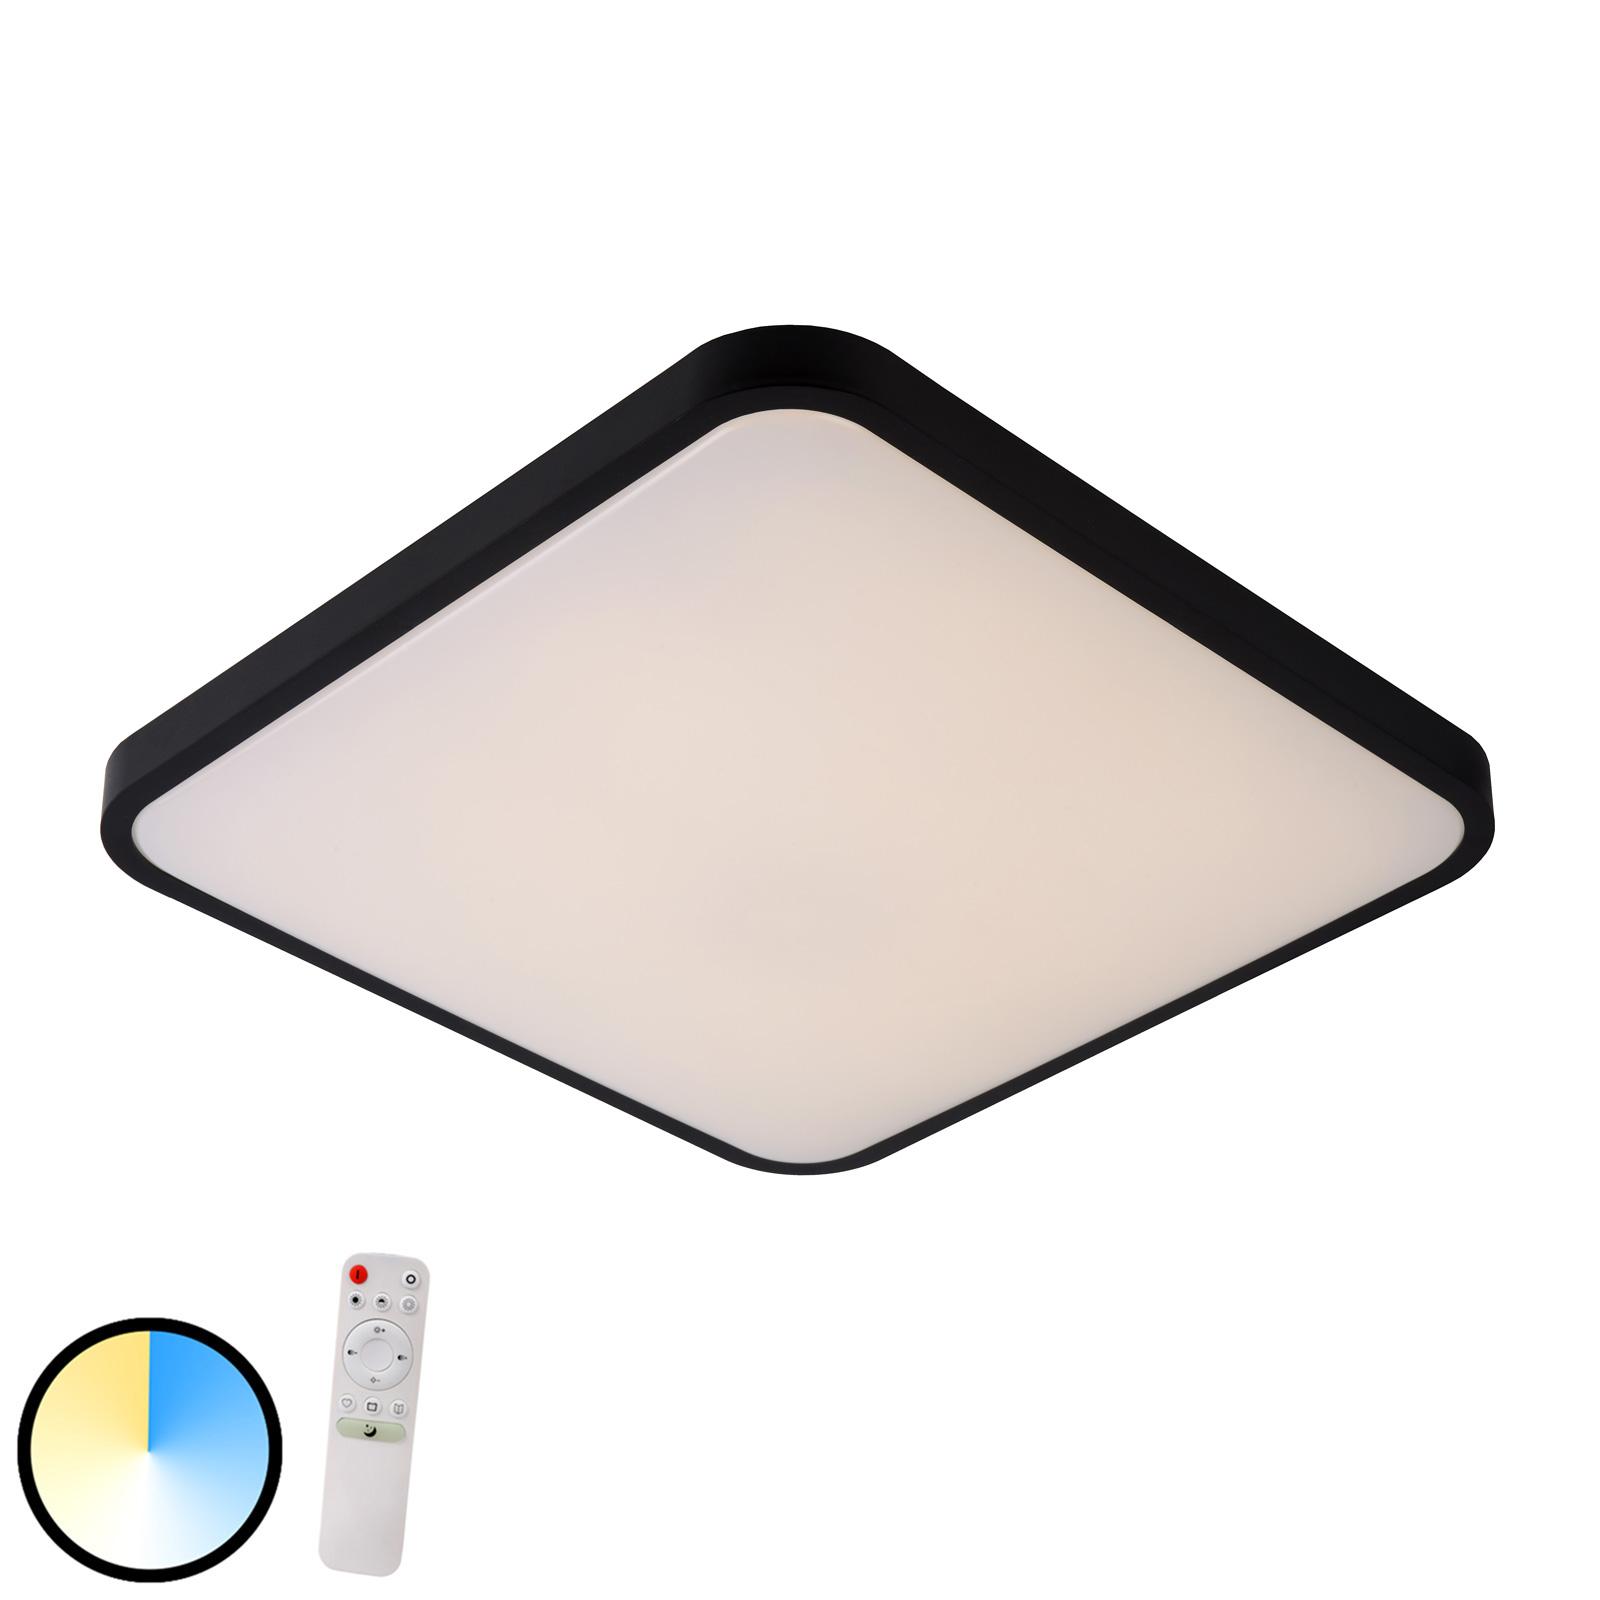 LED-kattovalaisin Polaris 43,4 cm x 43,4 cm